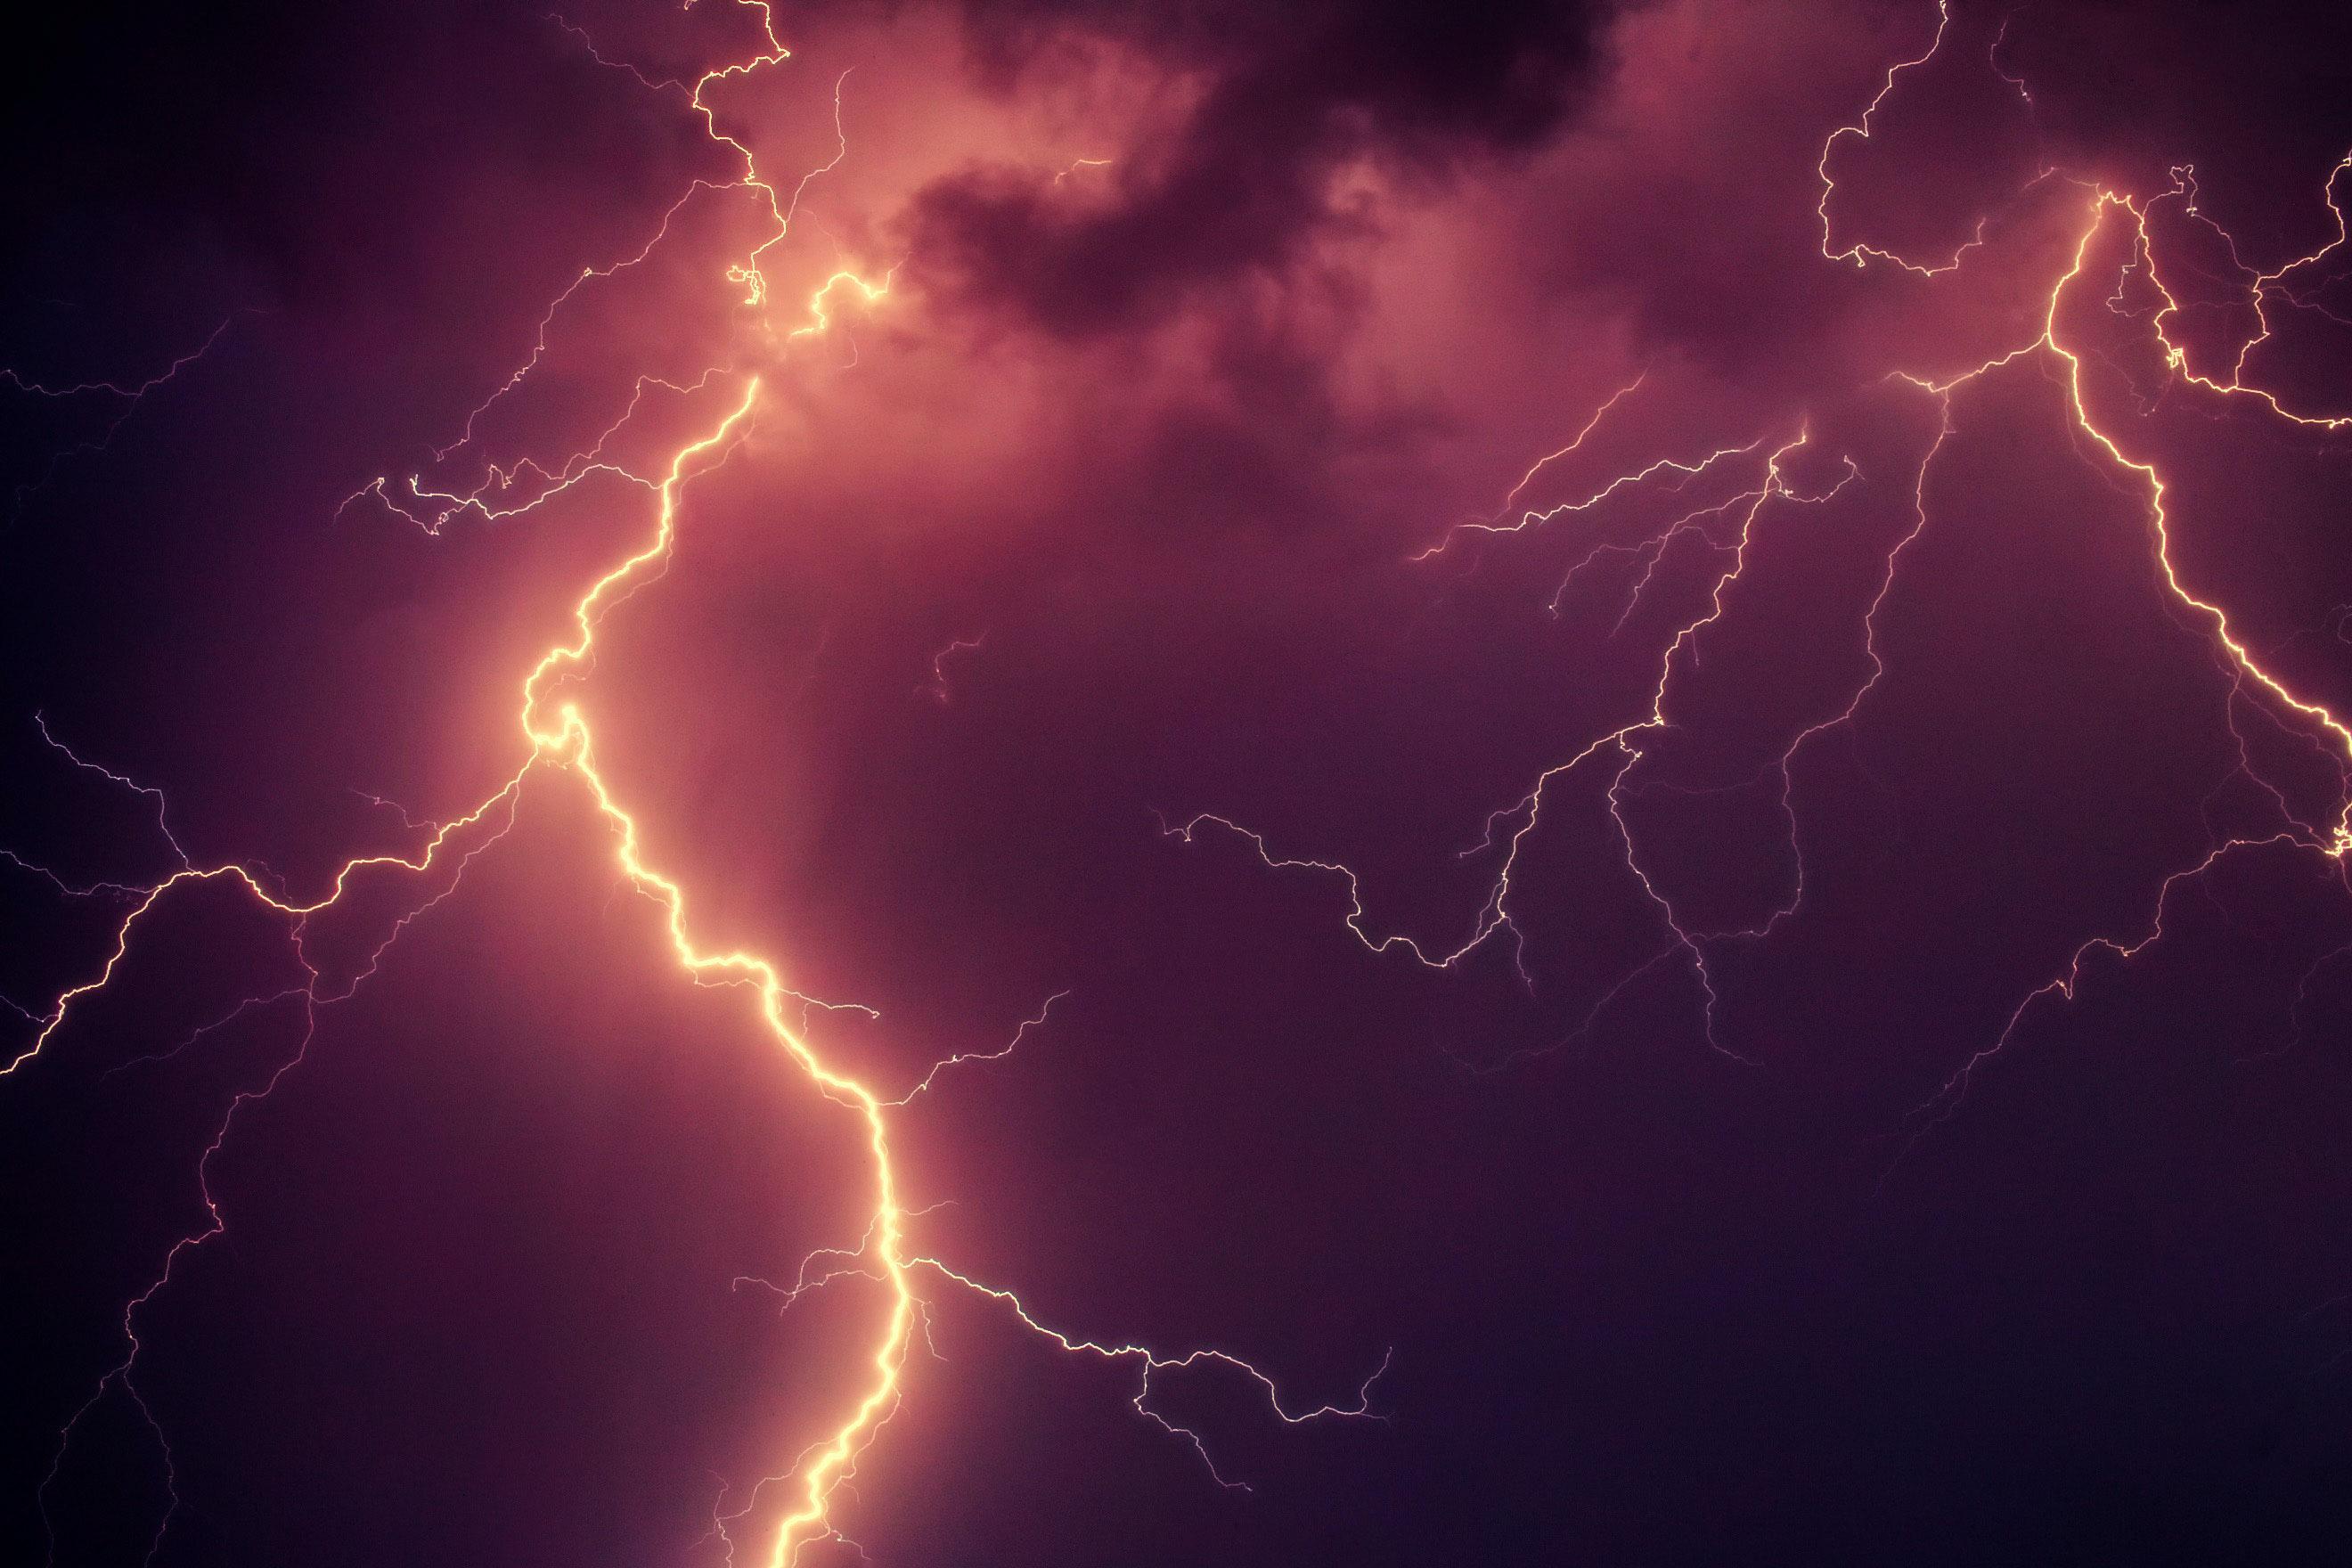 how lightning strikes could explain the